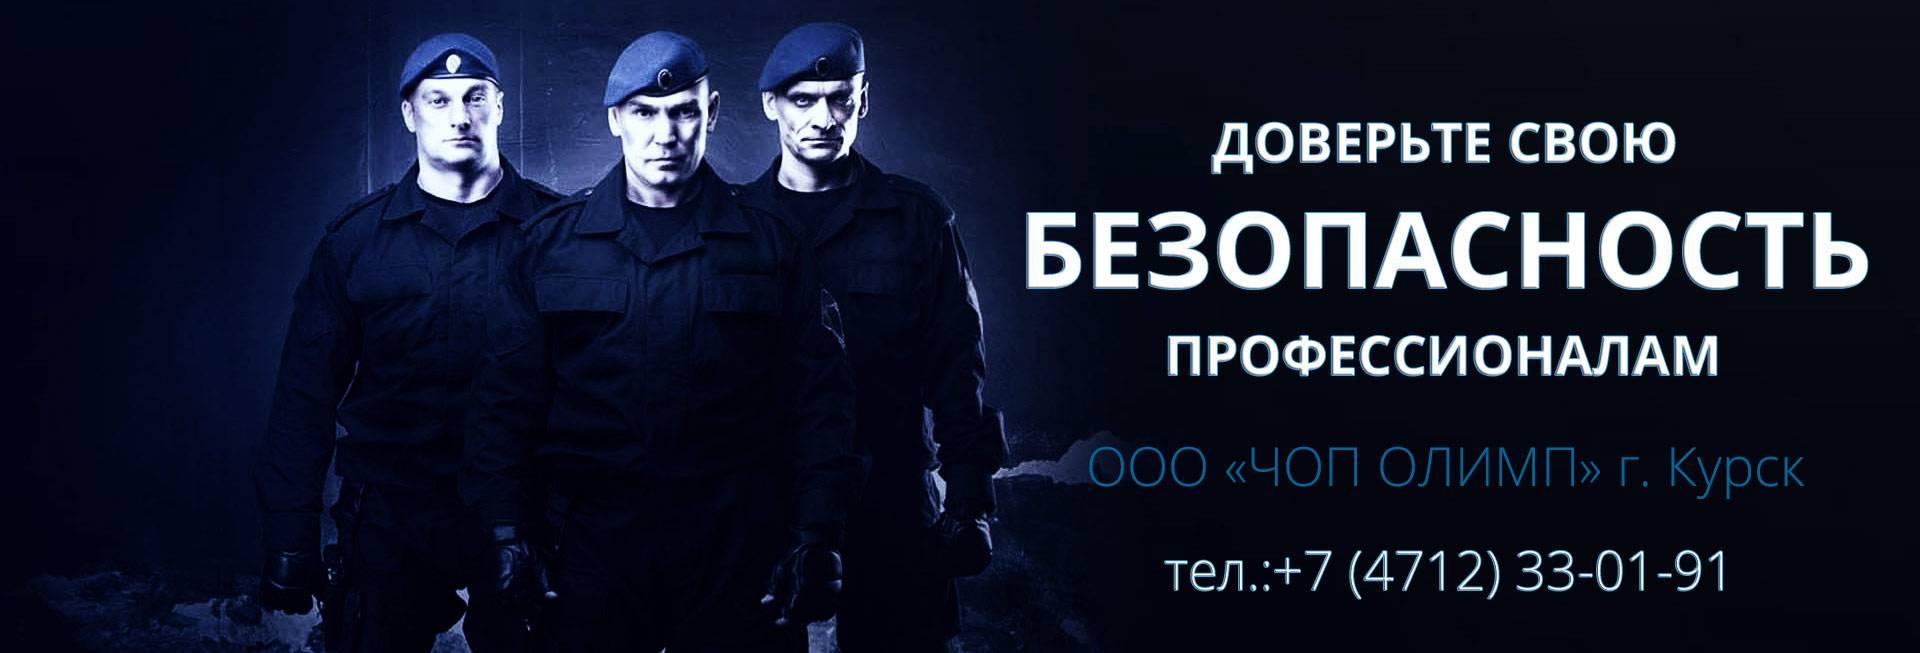 Охрана в Курск